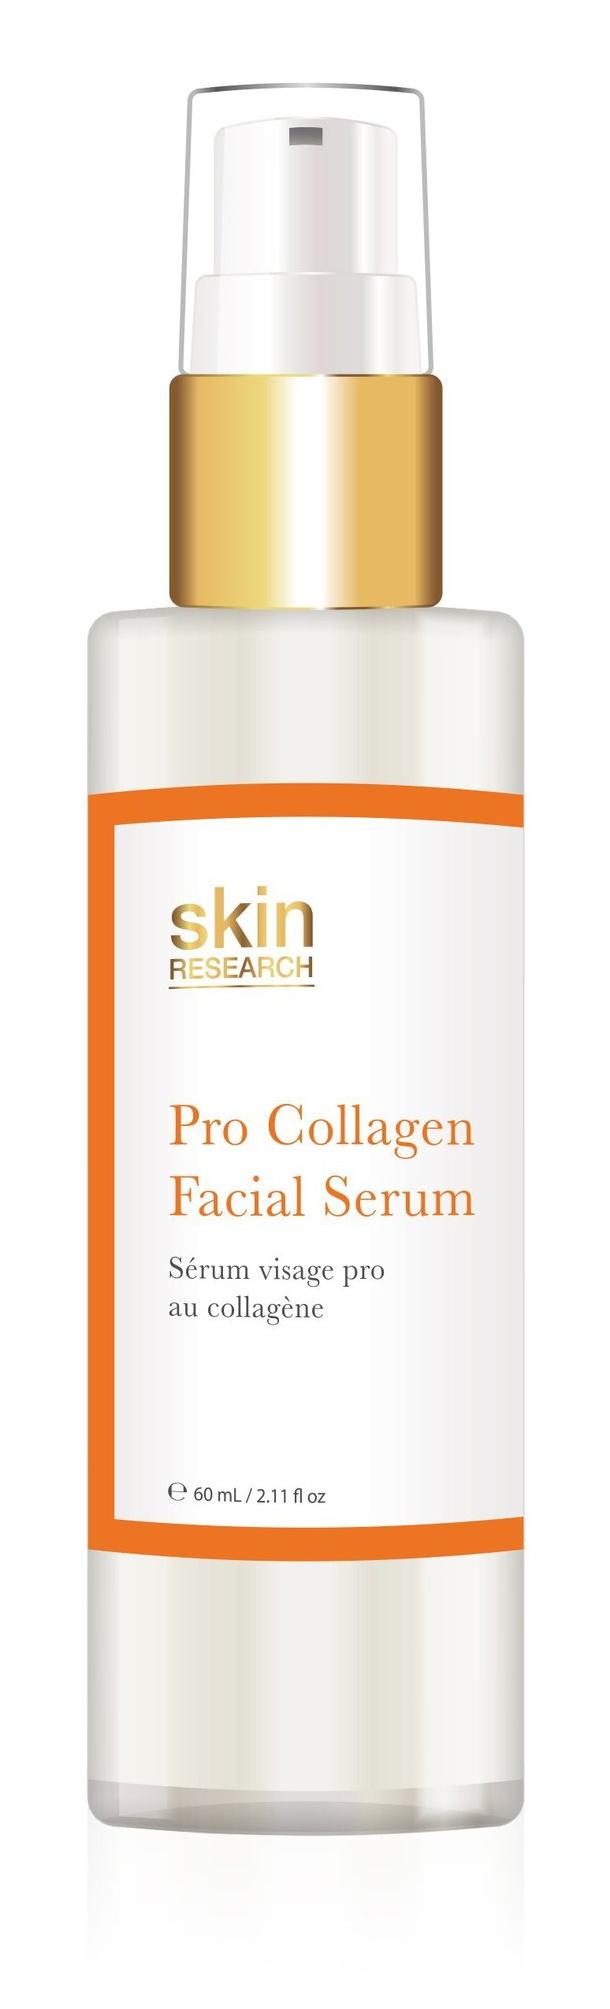 Skin Research Pro Collagen Facial Serum